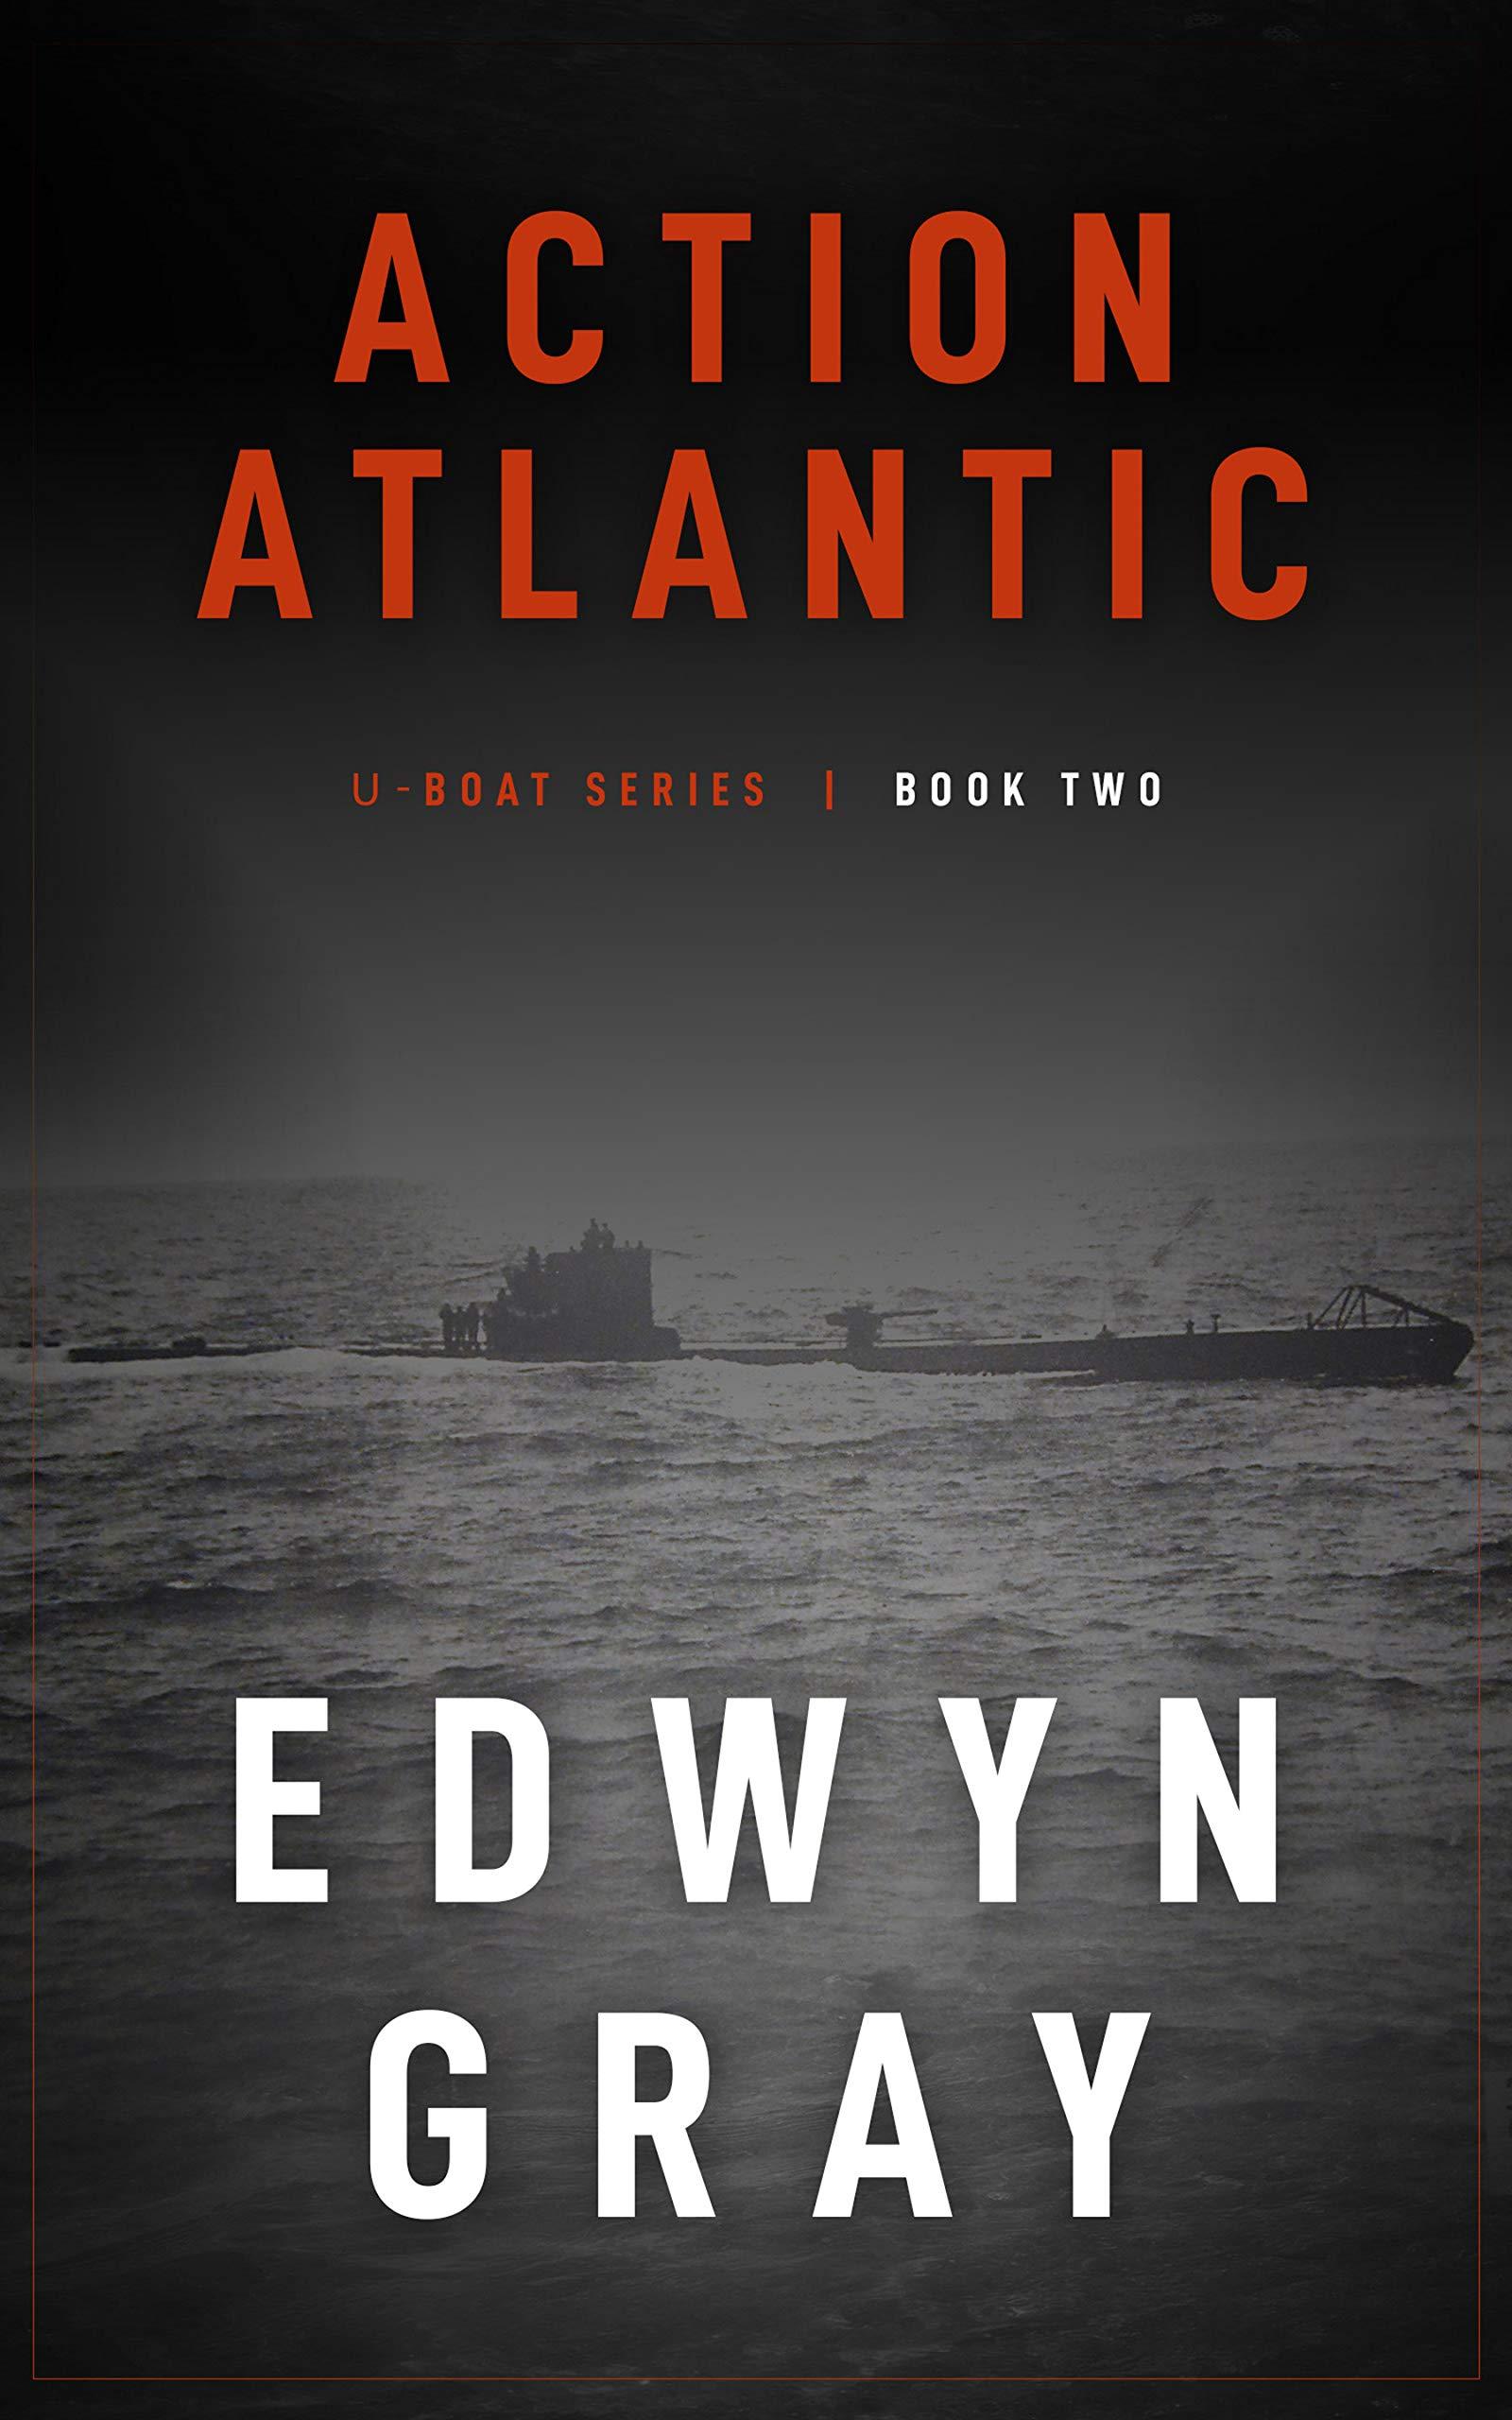 Action Atlantic: The U-boat Series